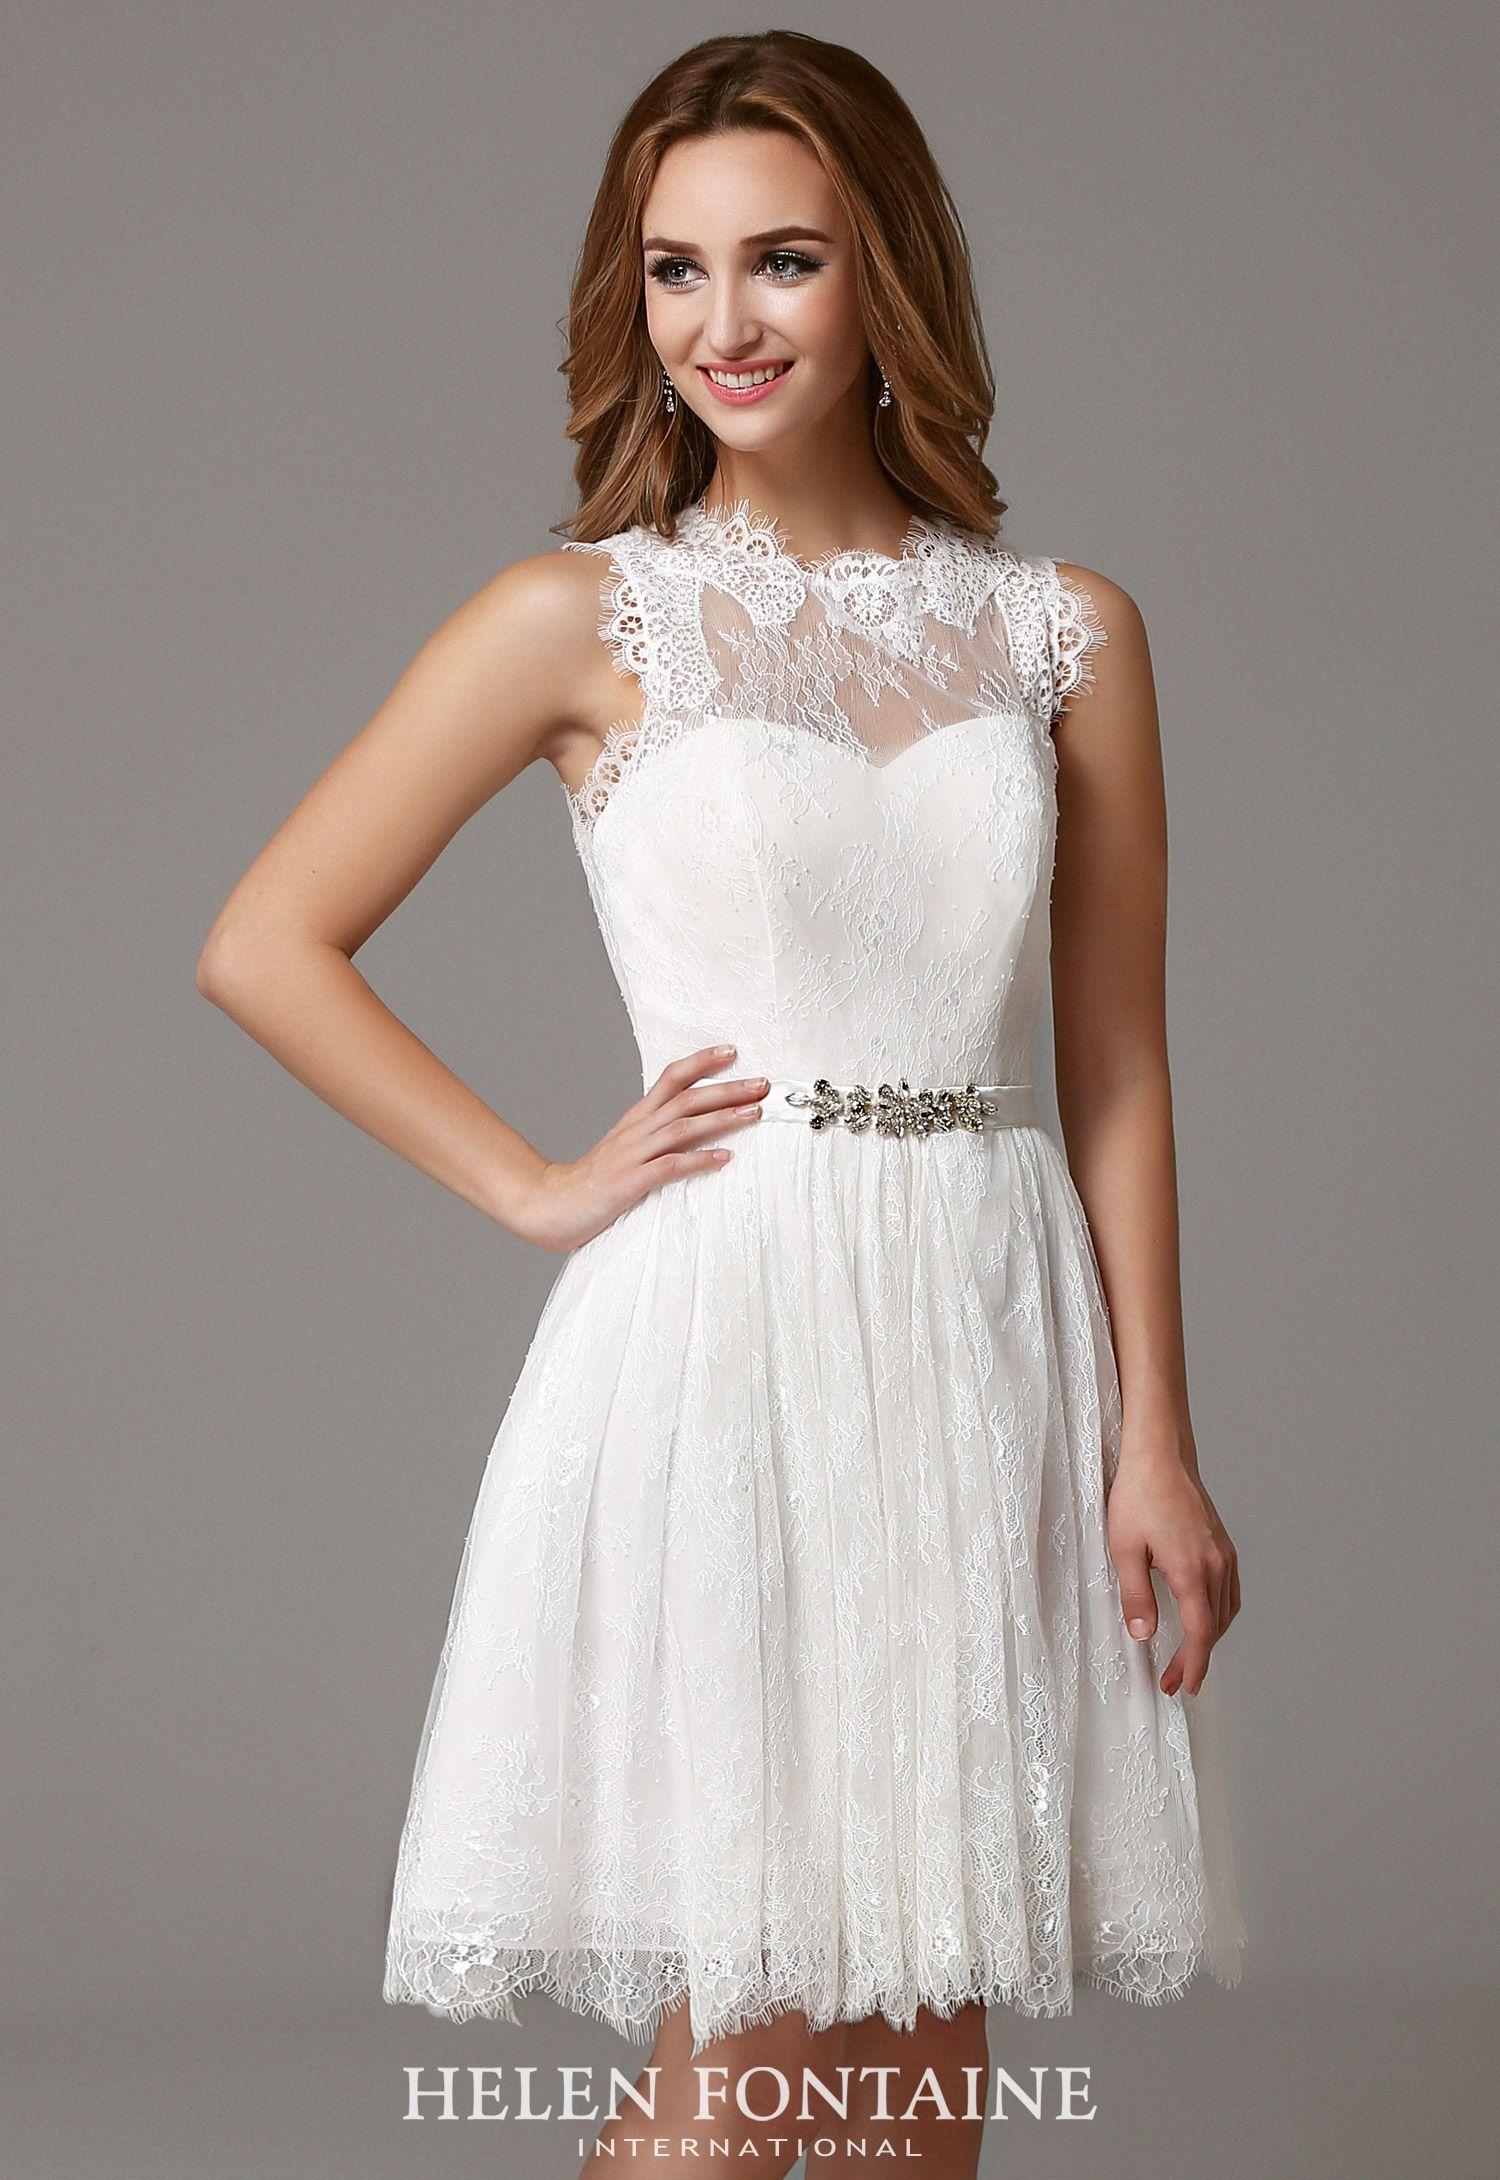 Short White Lace Bridesmaid Dresses A Line Knee Length Sleeveless Style Hfw2526 White Dresses Graduation Sparkly Bridesmaid Dress Bridesmaid Dresses Boho [ 2180 x 1500 Pixel ]